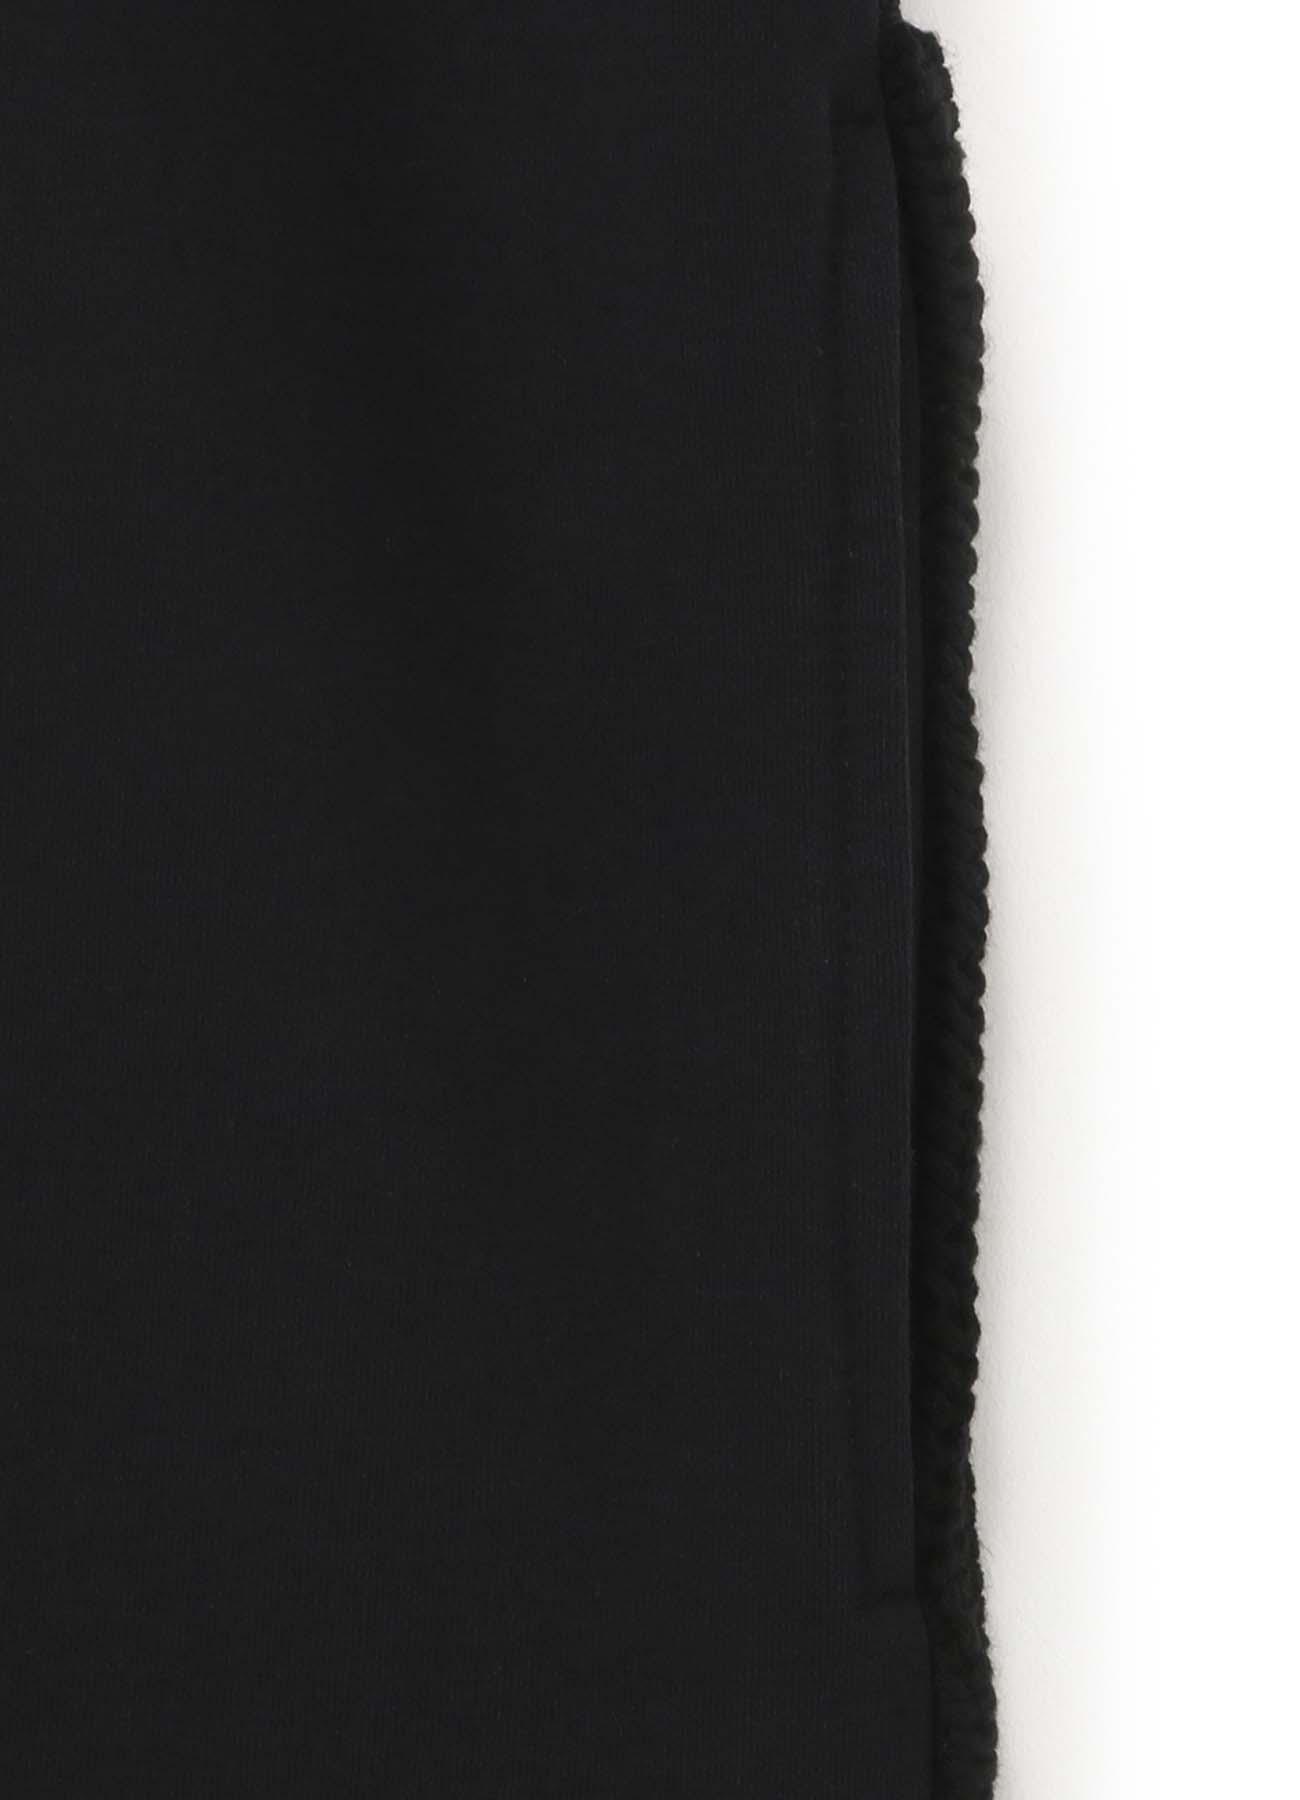 FRED PERRY合作针织x Fleece Long派克大衣(男装)